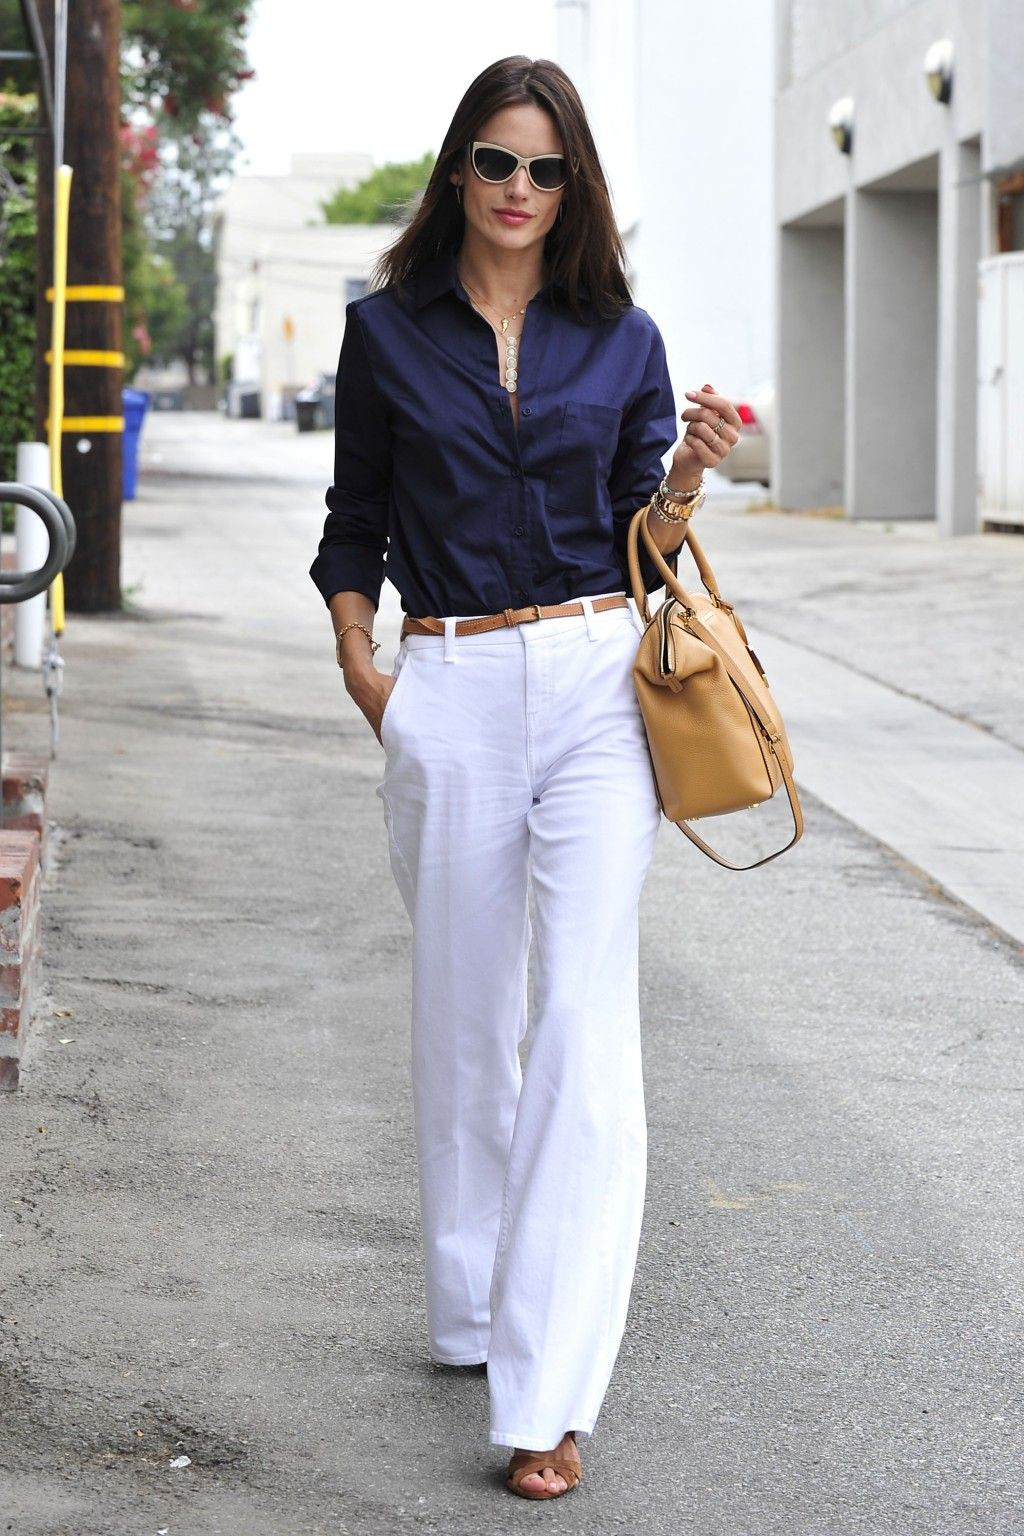 Alessandra ambrosio street style, Alessandra Ambrosio